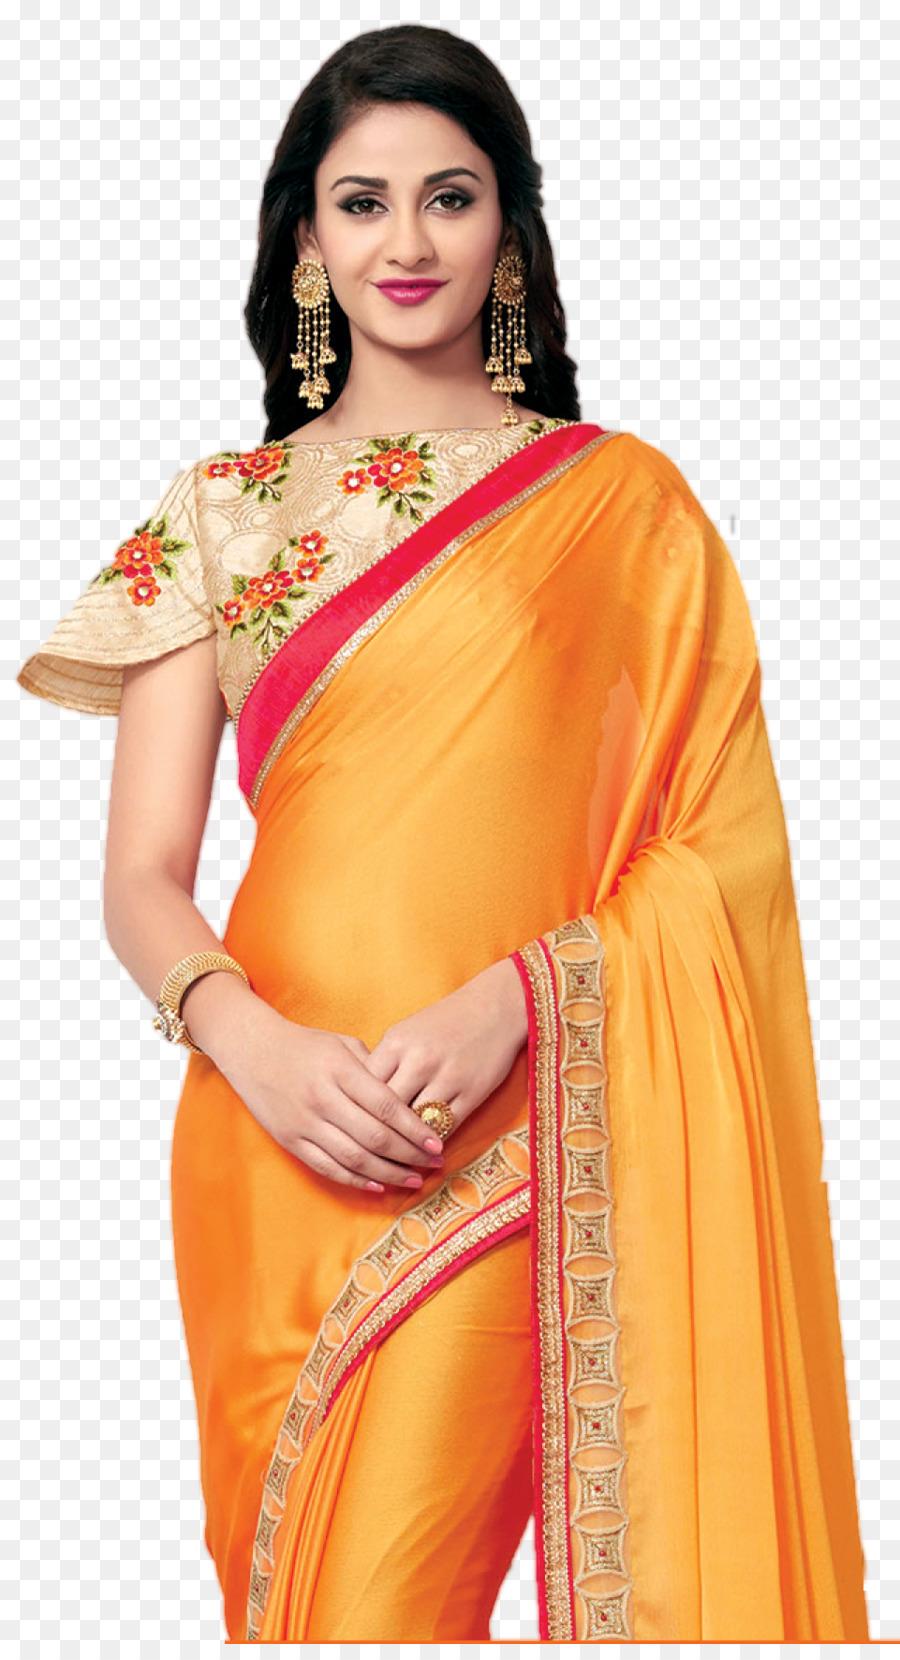 Wedding Sari - Wedding Dress